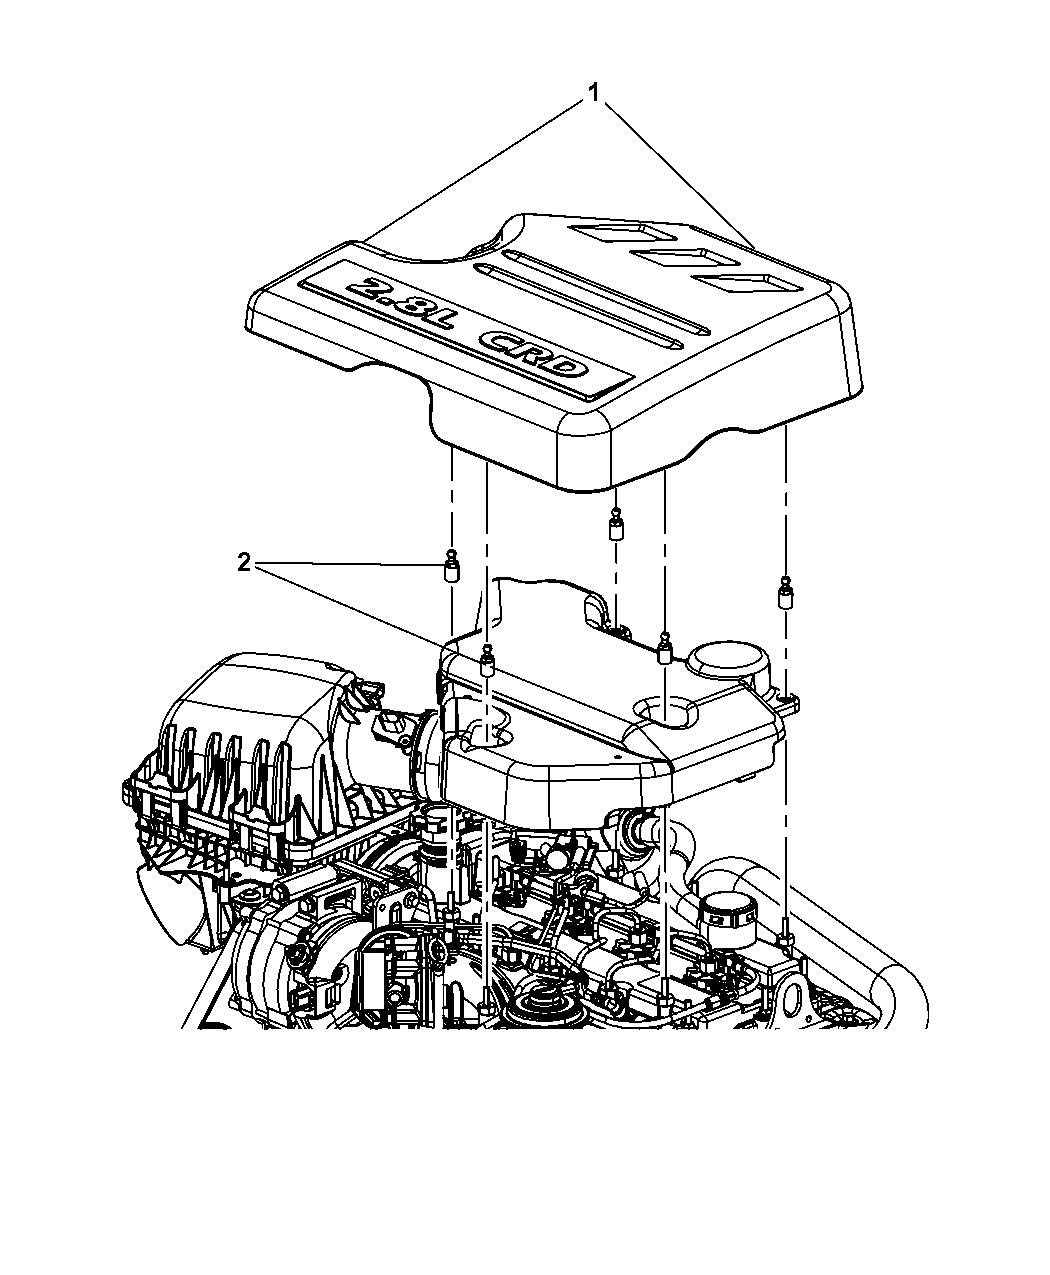 mopar 4593809ac mitsubishi engine diagrams 2010 chrysler engine diagram #14